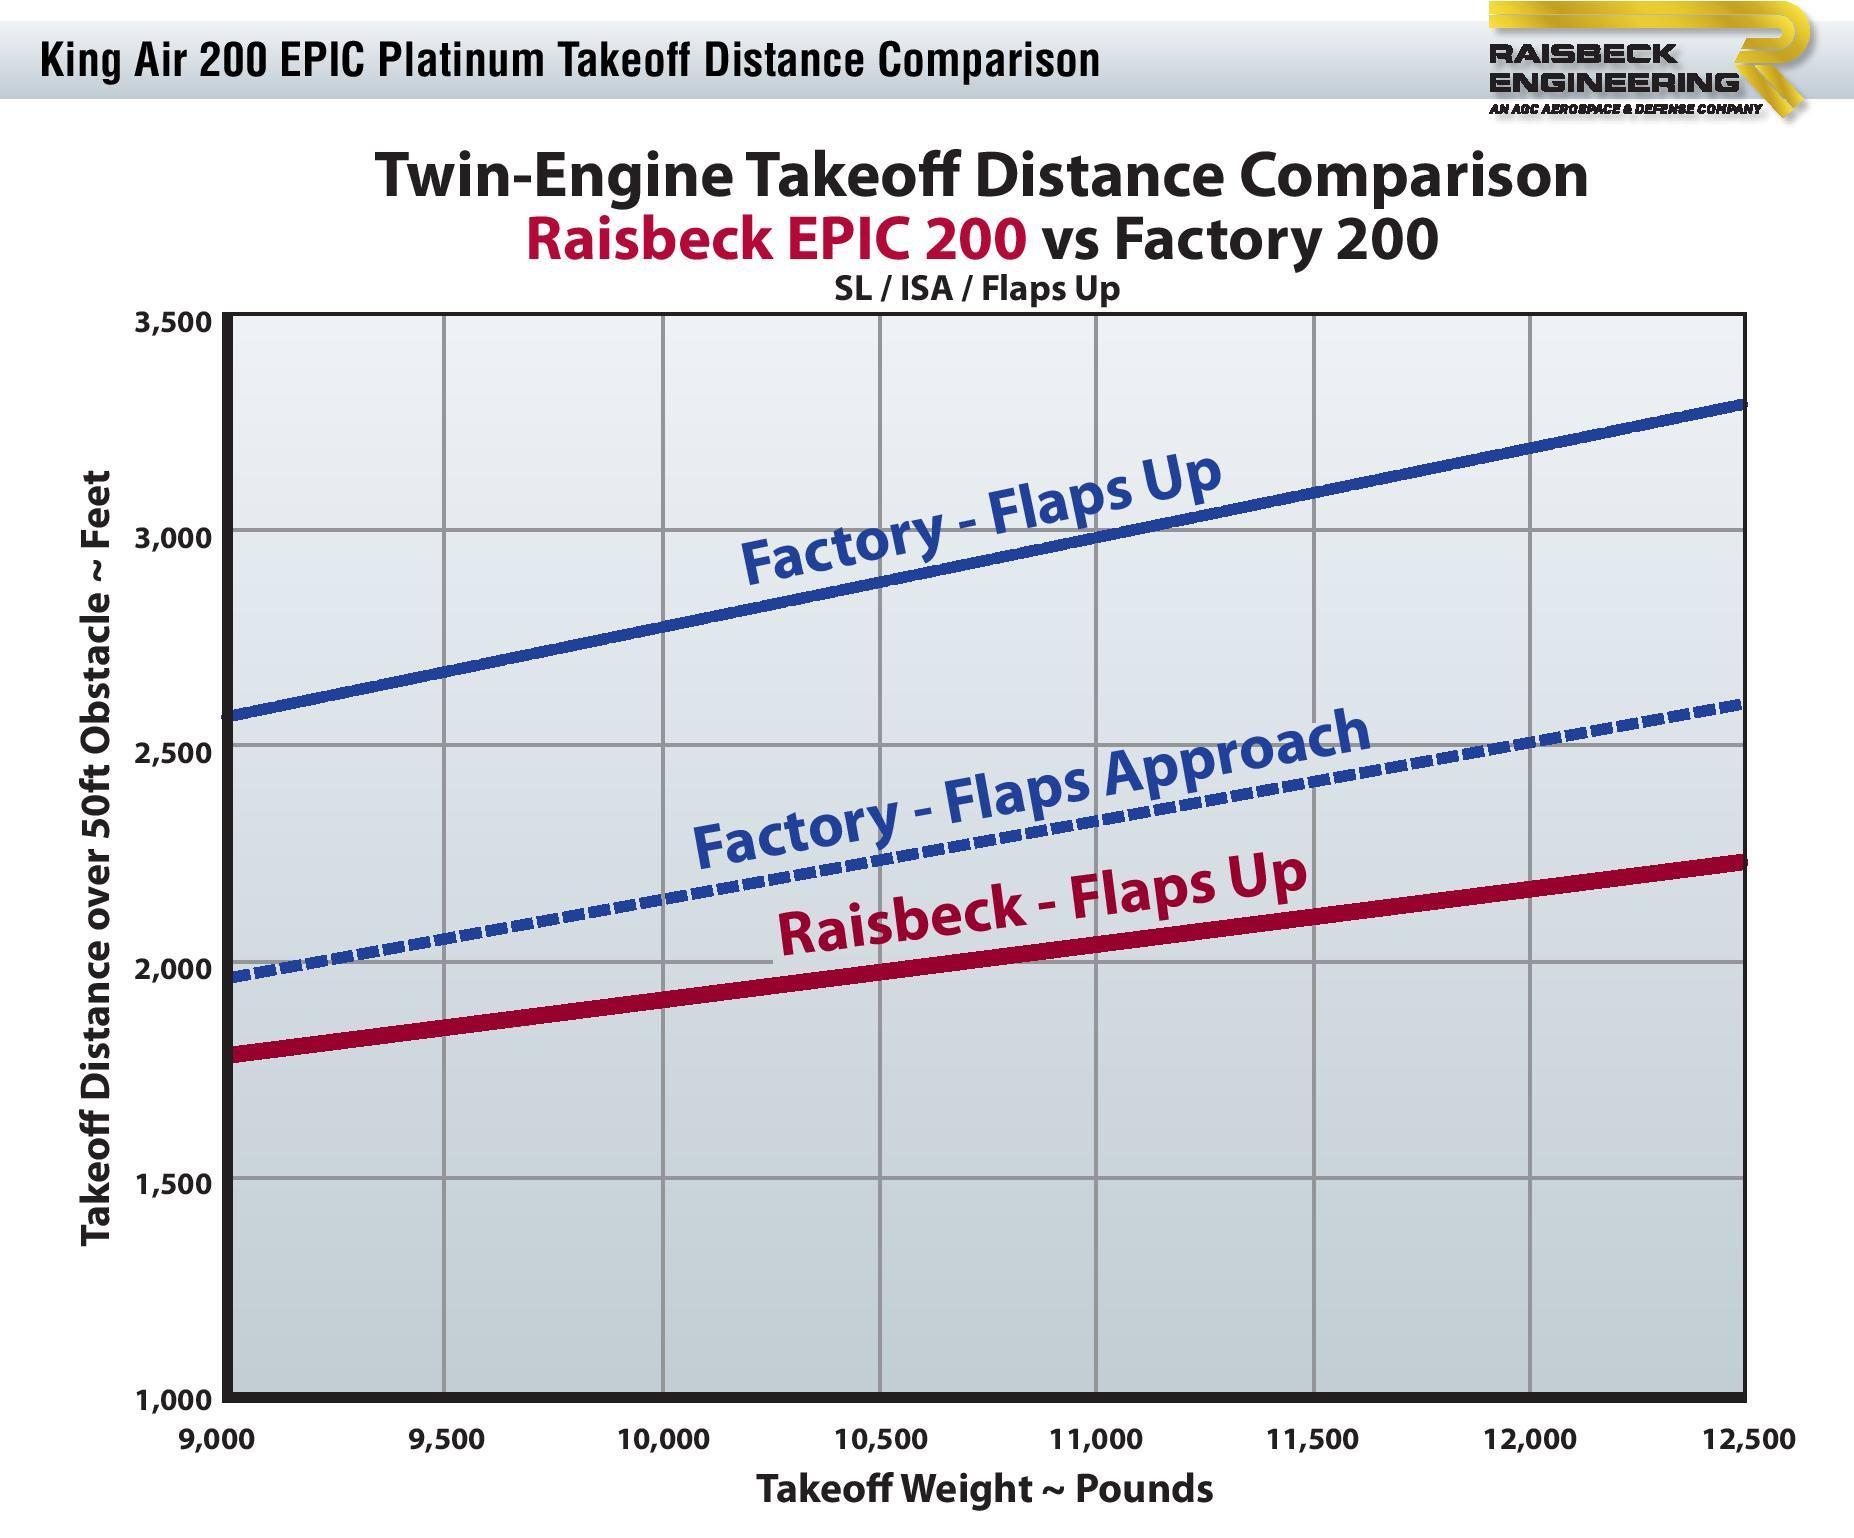 200 EPIC Platinum Takeoff Distance Chart